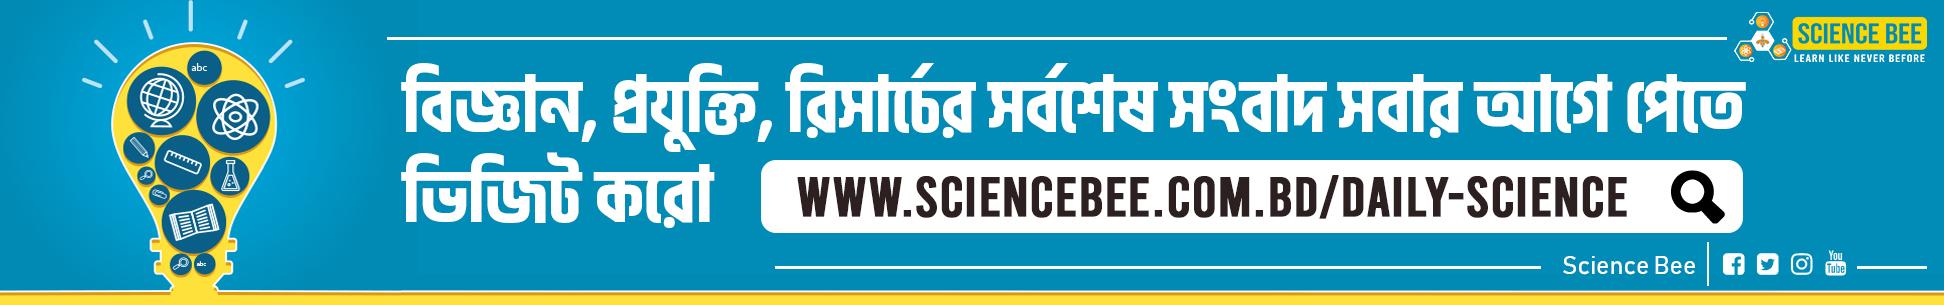 https://www.sciencebee.com.bd/daily-science